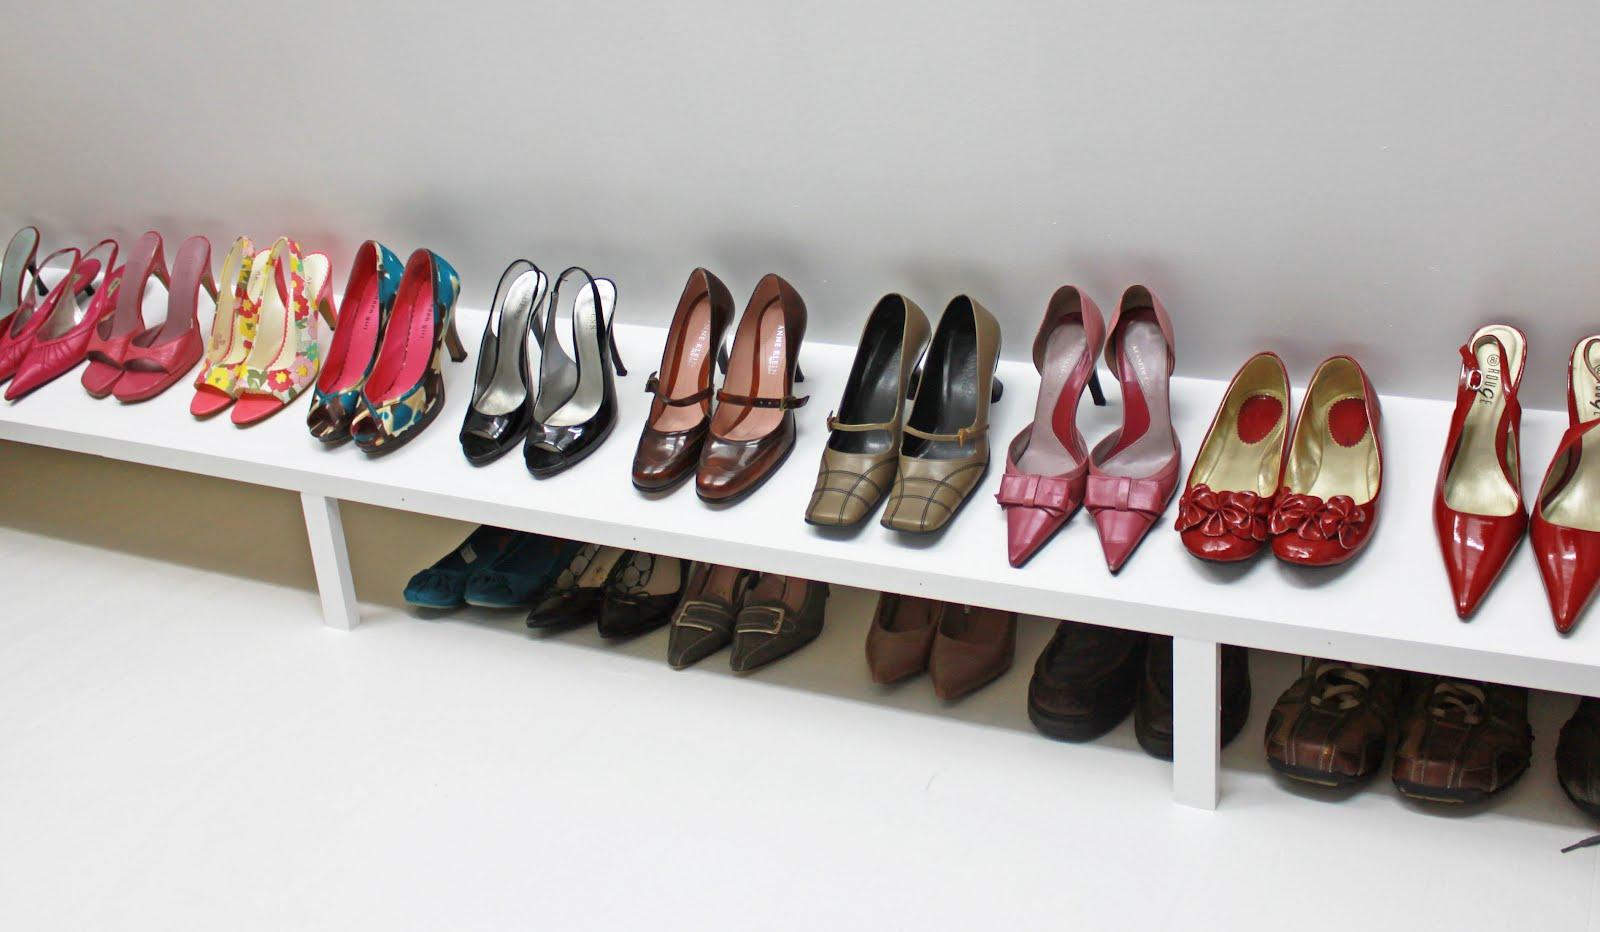 Finest Closet Shoe Rack Ideas Design And Ideas With Shoe Shelves Ideas.